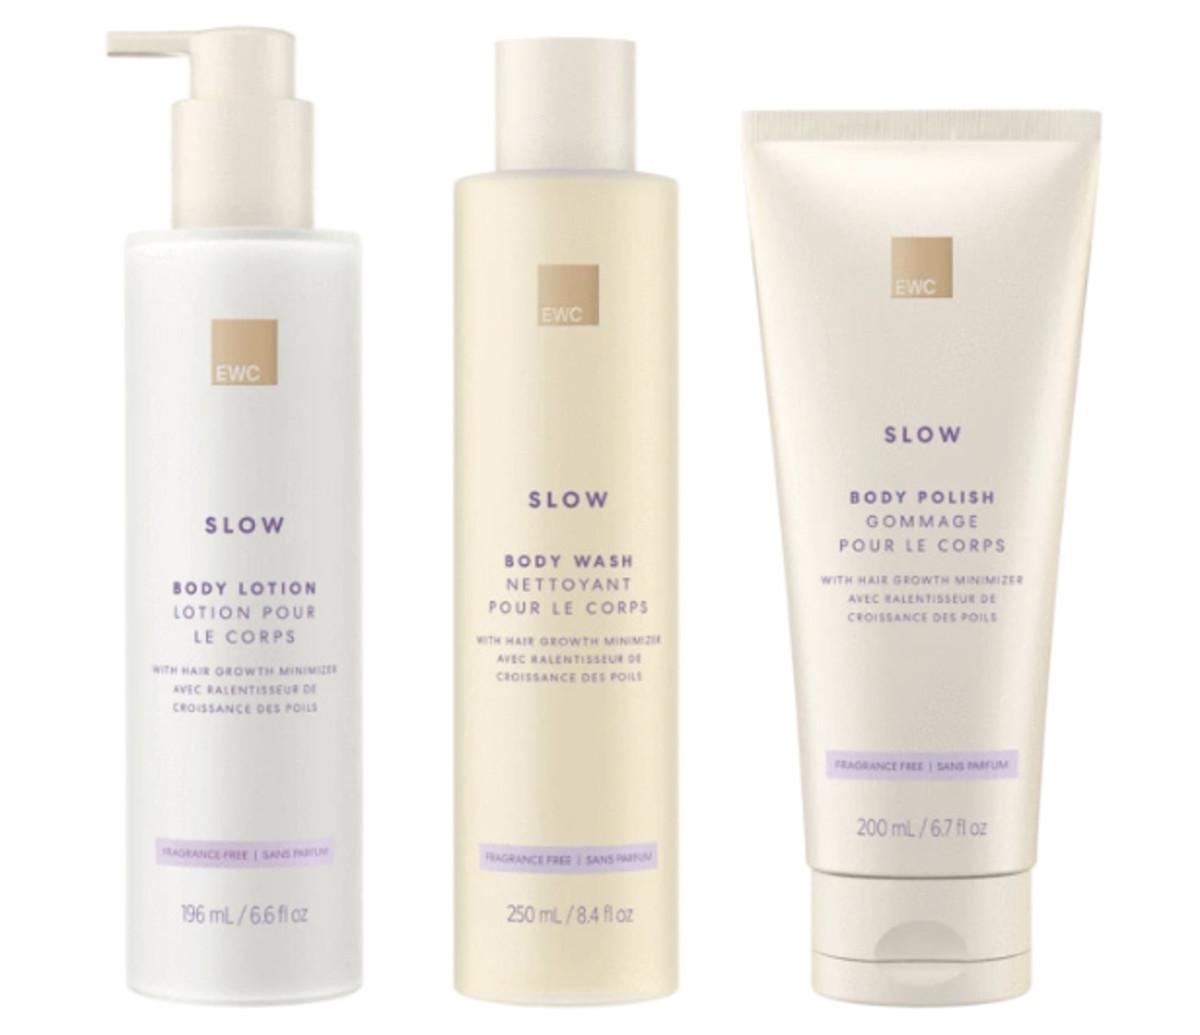 European Wax Center Slow Body Lotion, Body Wash, and Body Polish